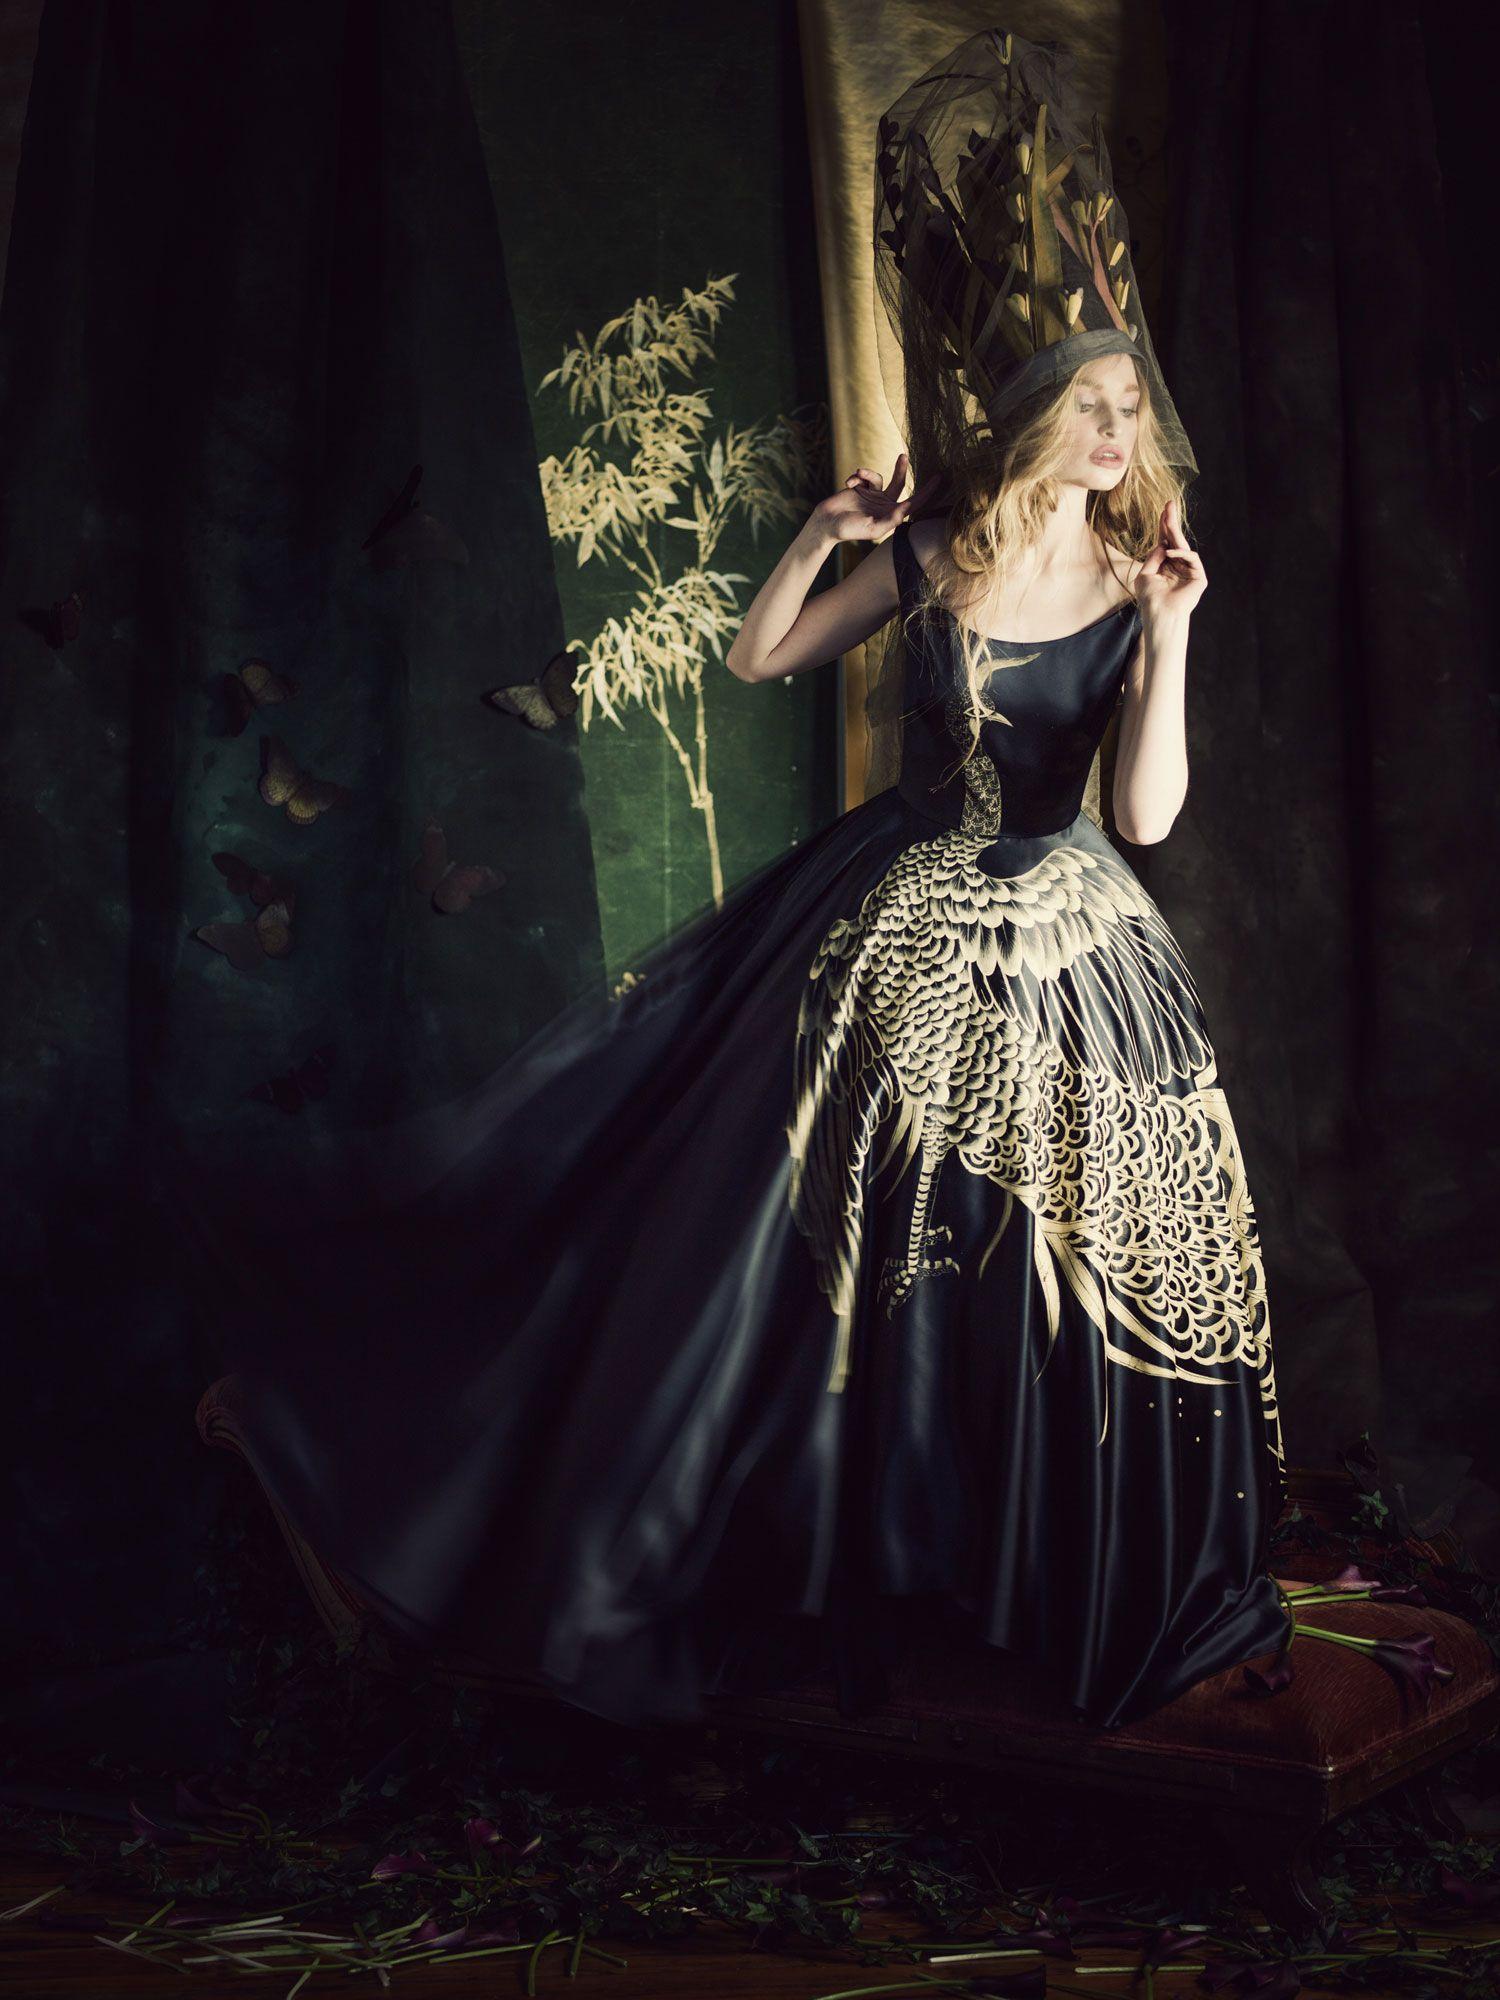 Cece wedding dress  This Is Amazing Misha Nonoo and de Gournay dress  Photo by Jamie